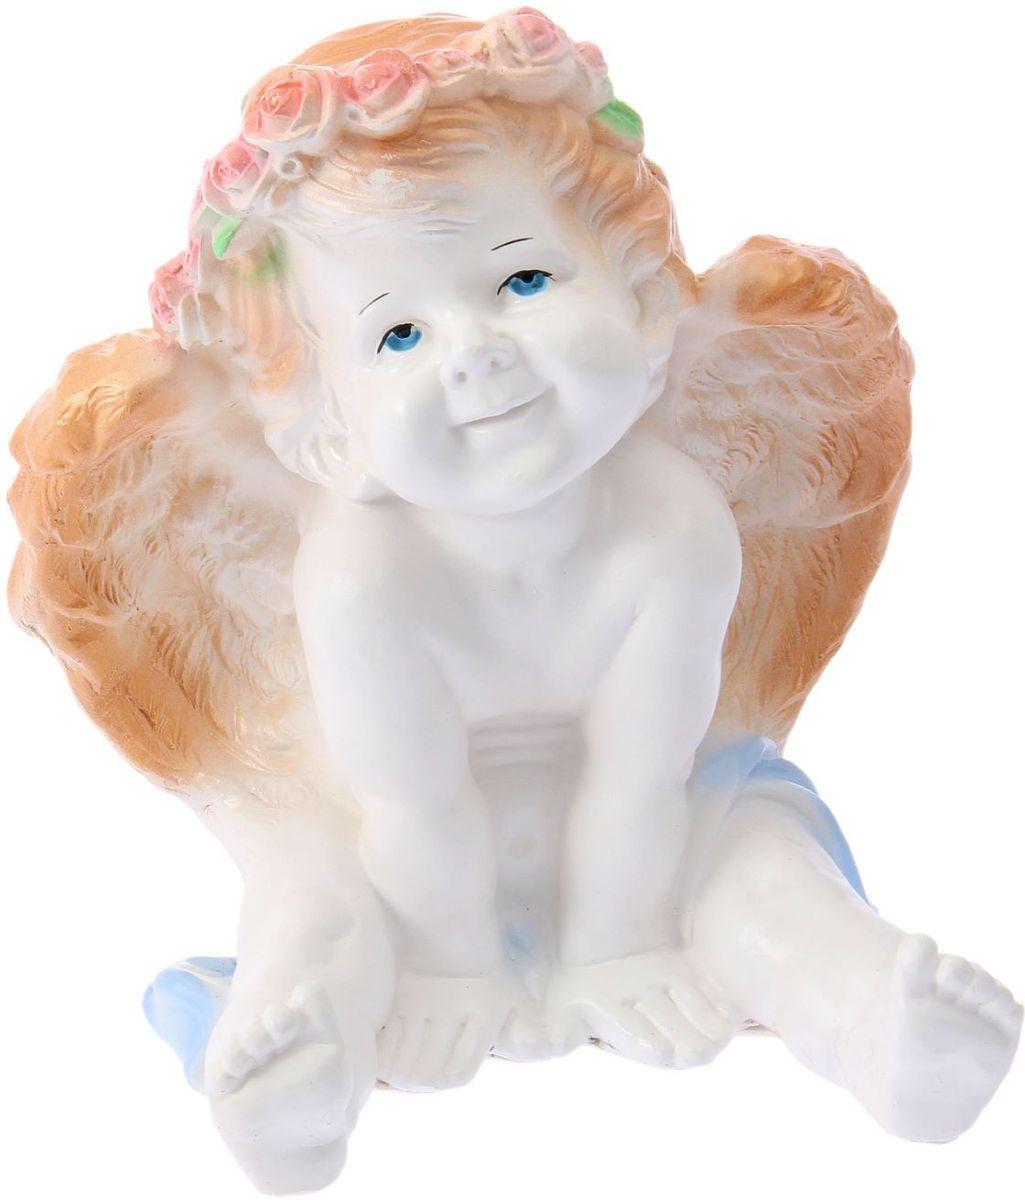 Фигура садовая Ангел карапуз сидя, цвет: белый, золотистый, 20 х 20 х 25 см фигура садовая ежик с лопатой 12 х 12 х 21 см